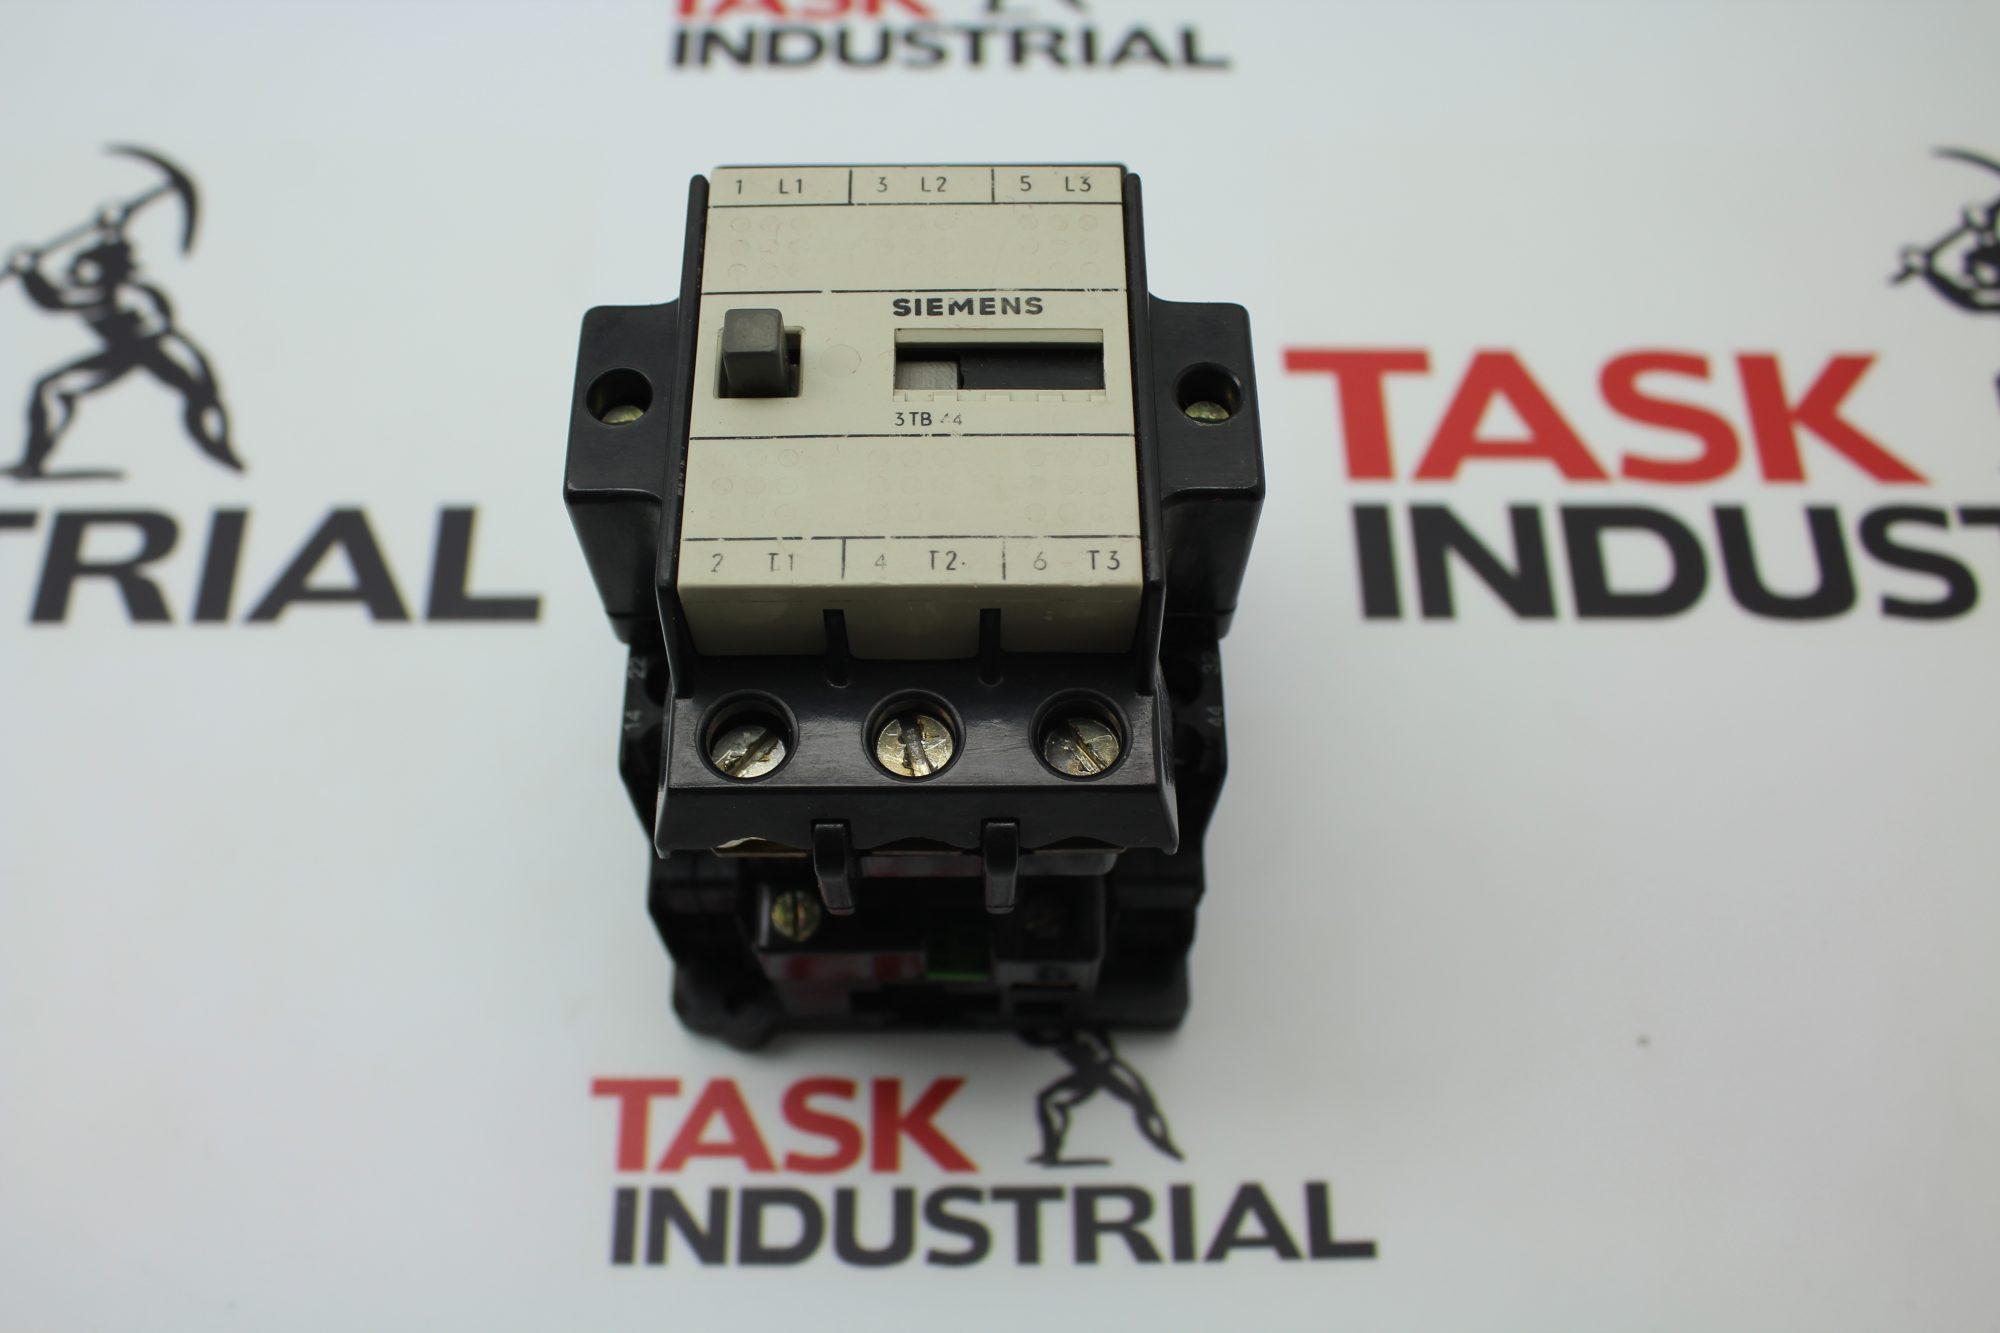 Eaton Cutler Hammer 10250t 53 1 No Push Button Contact Block 10250t53 Fuse Box Siemens 3tb4417 3m 3 Pole Contactor